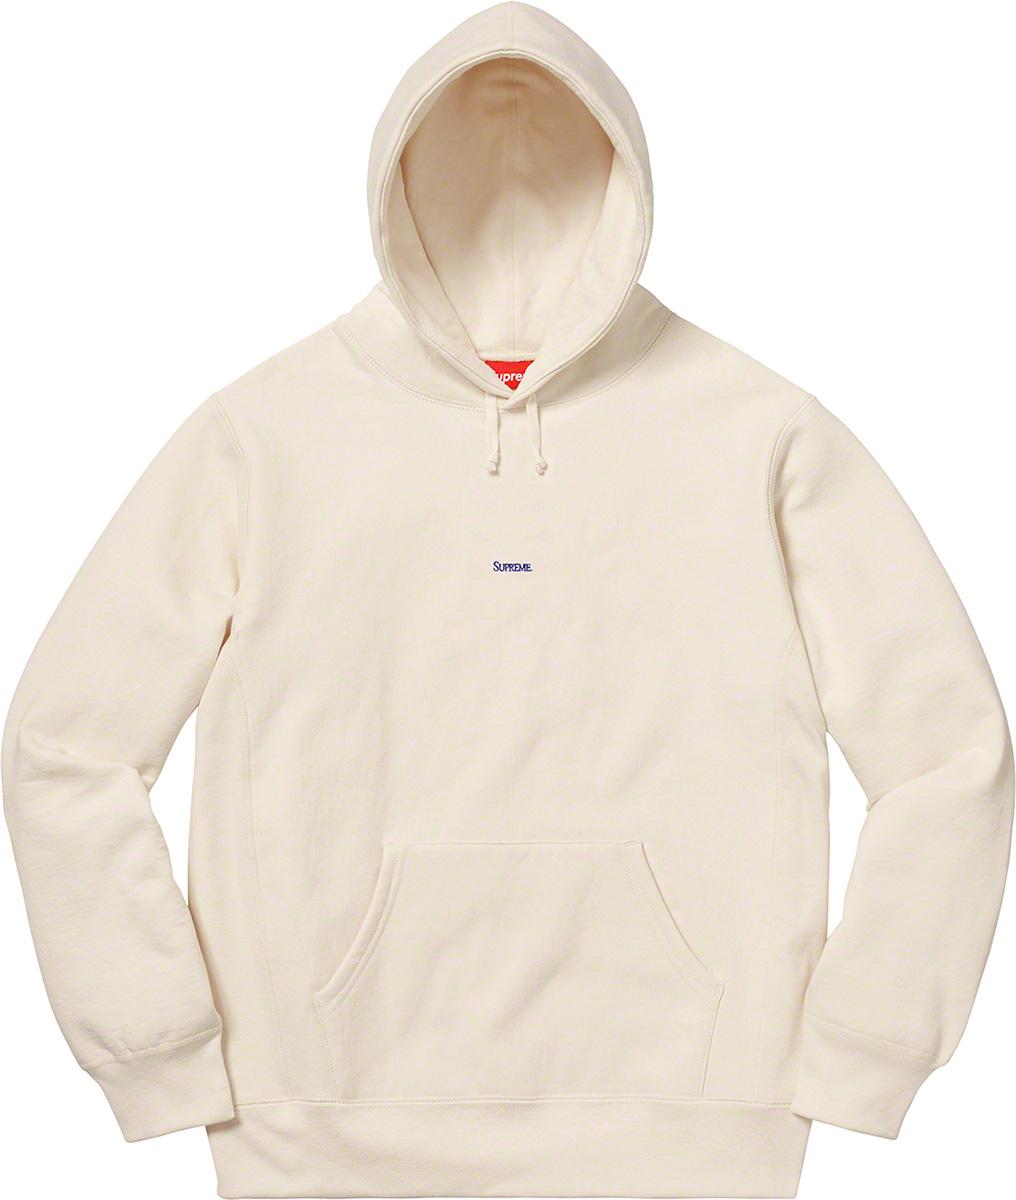 supreme-19aw-19fw-fall-winter-micro-logo-hooded-sweatshirt